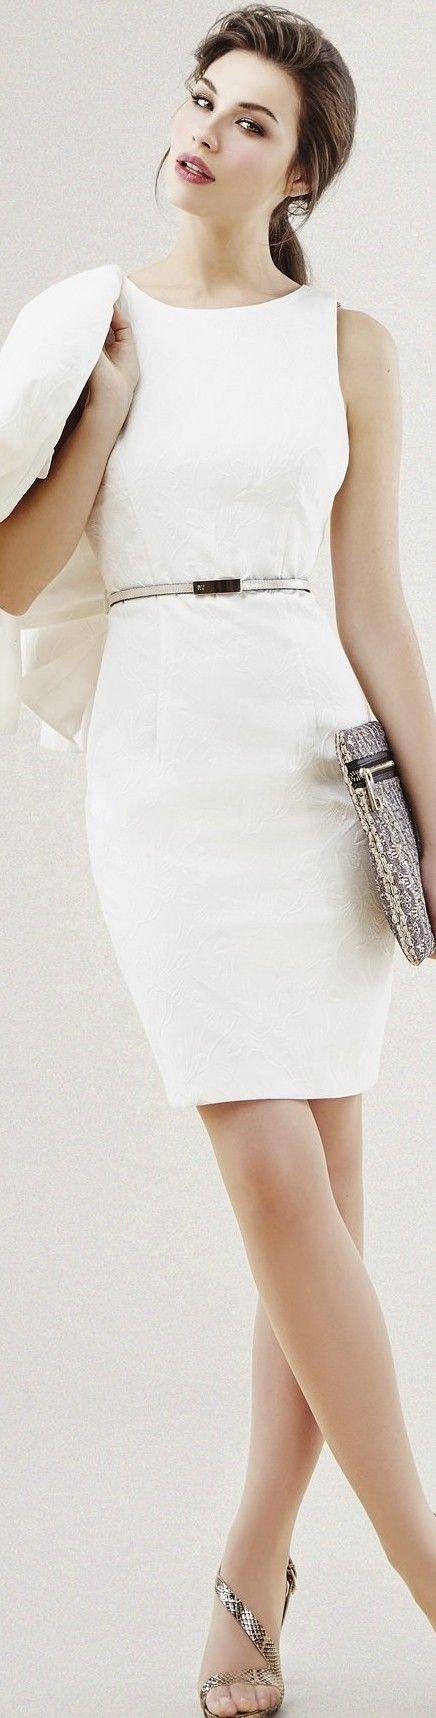 Roberto Verino women fashion outfit clothing stylish apparel @roressclothes closet ideas